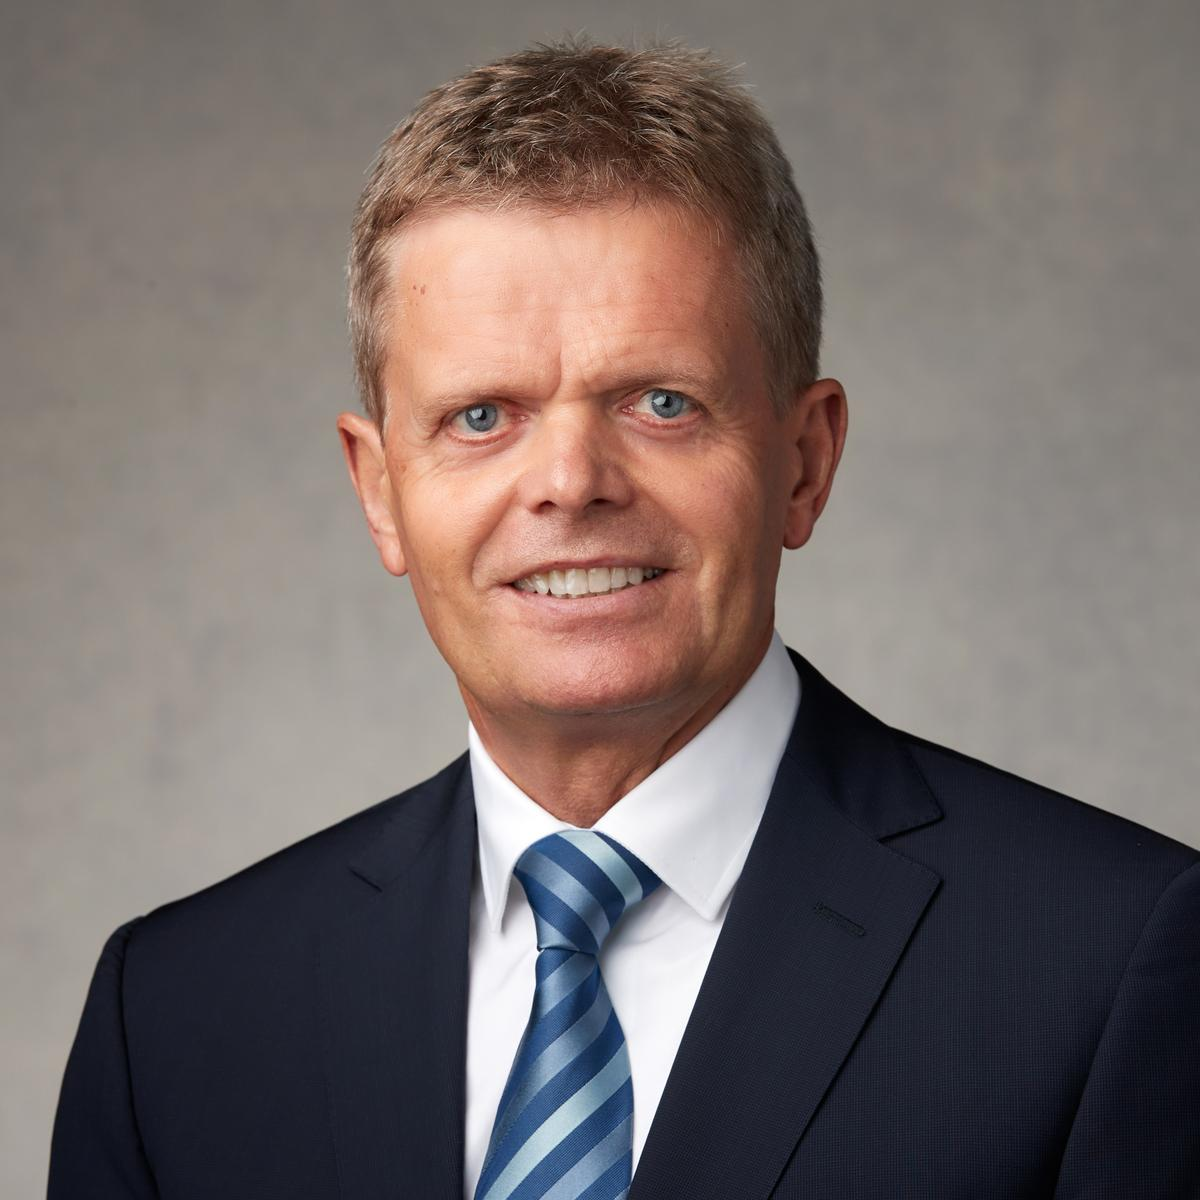 Élder Engbjerg